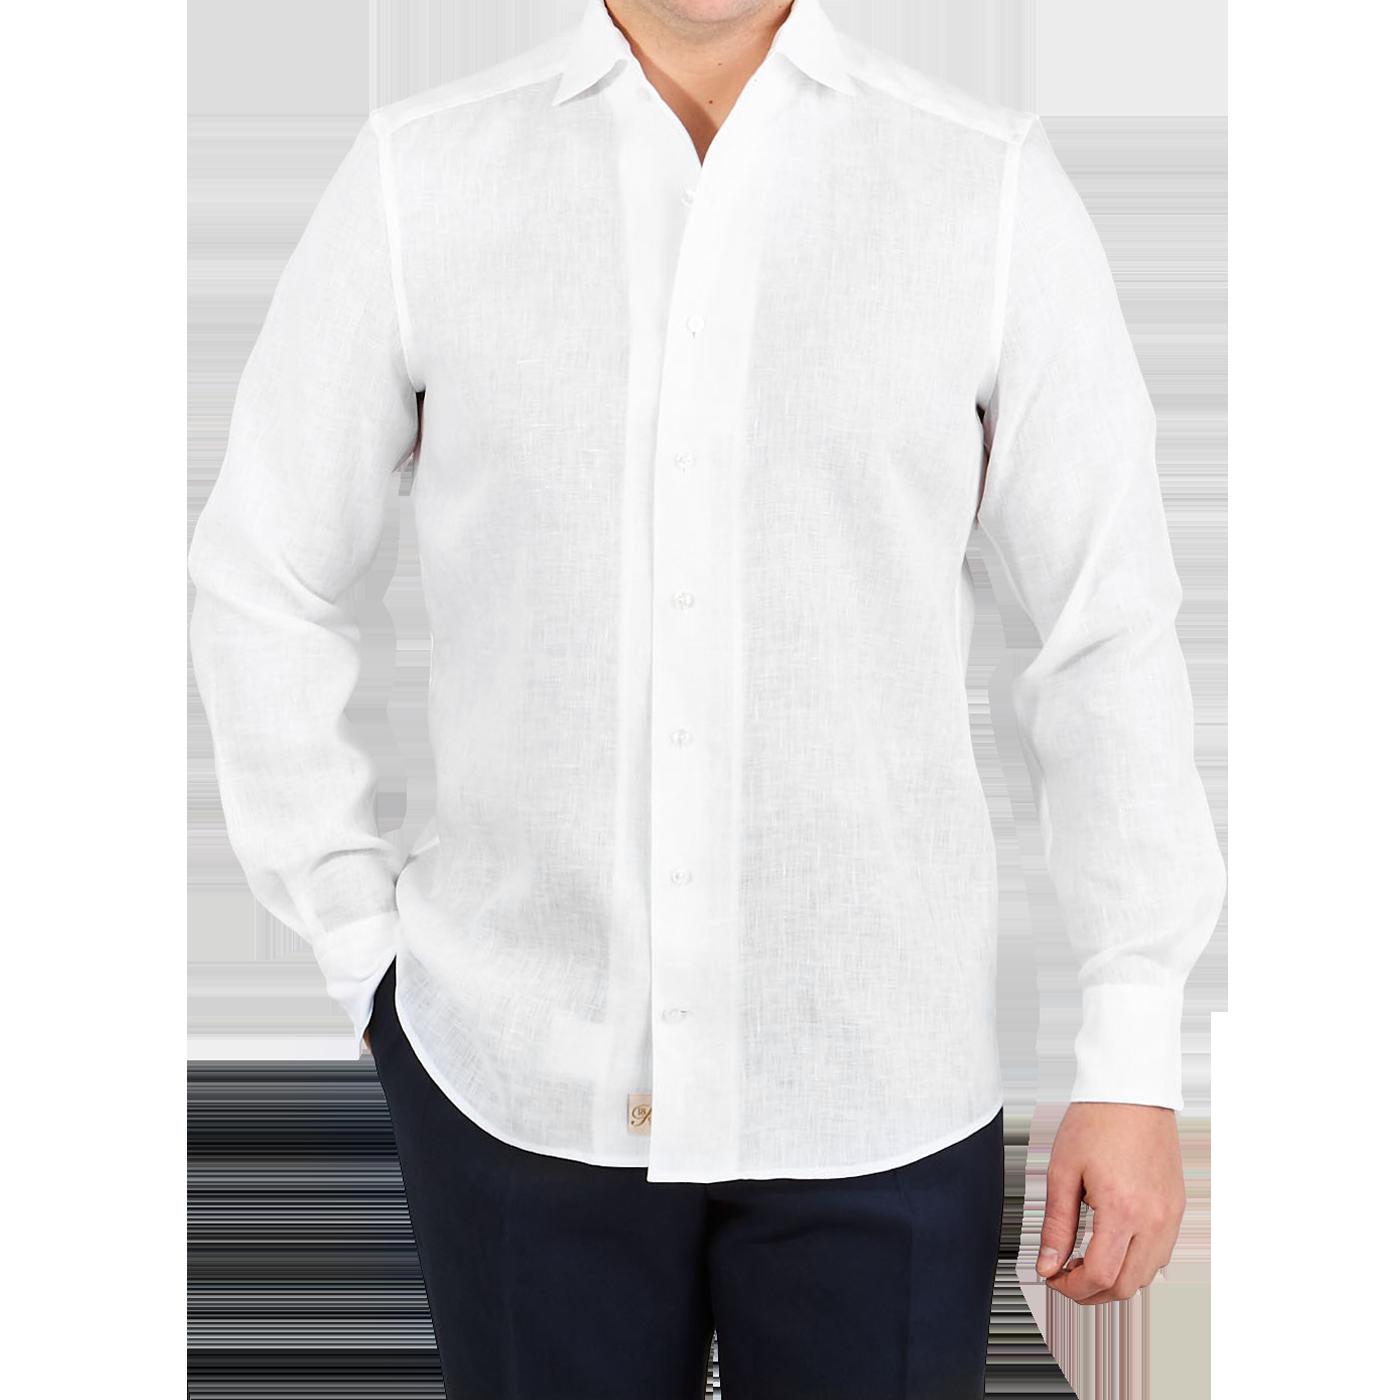 Stenströms White Linen Slimline 1899 Shirt Front